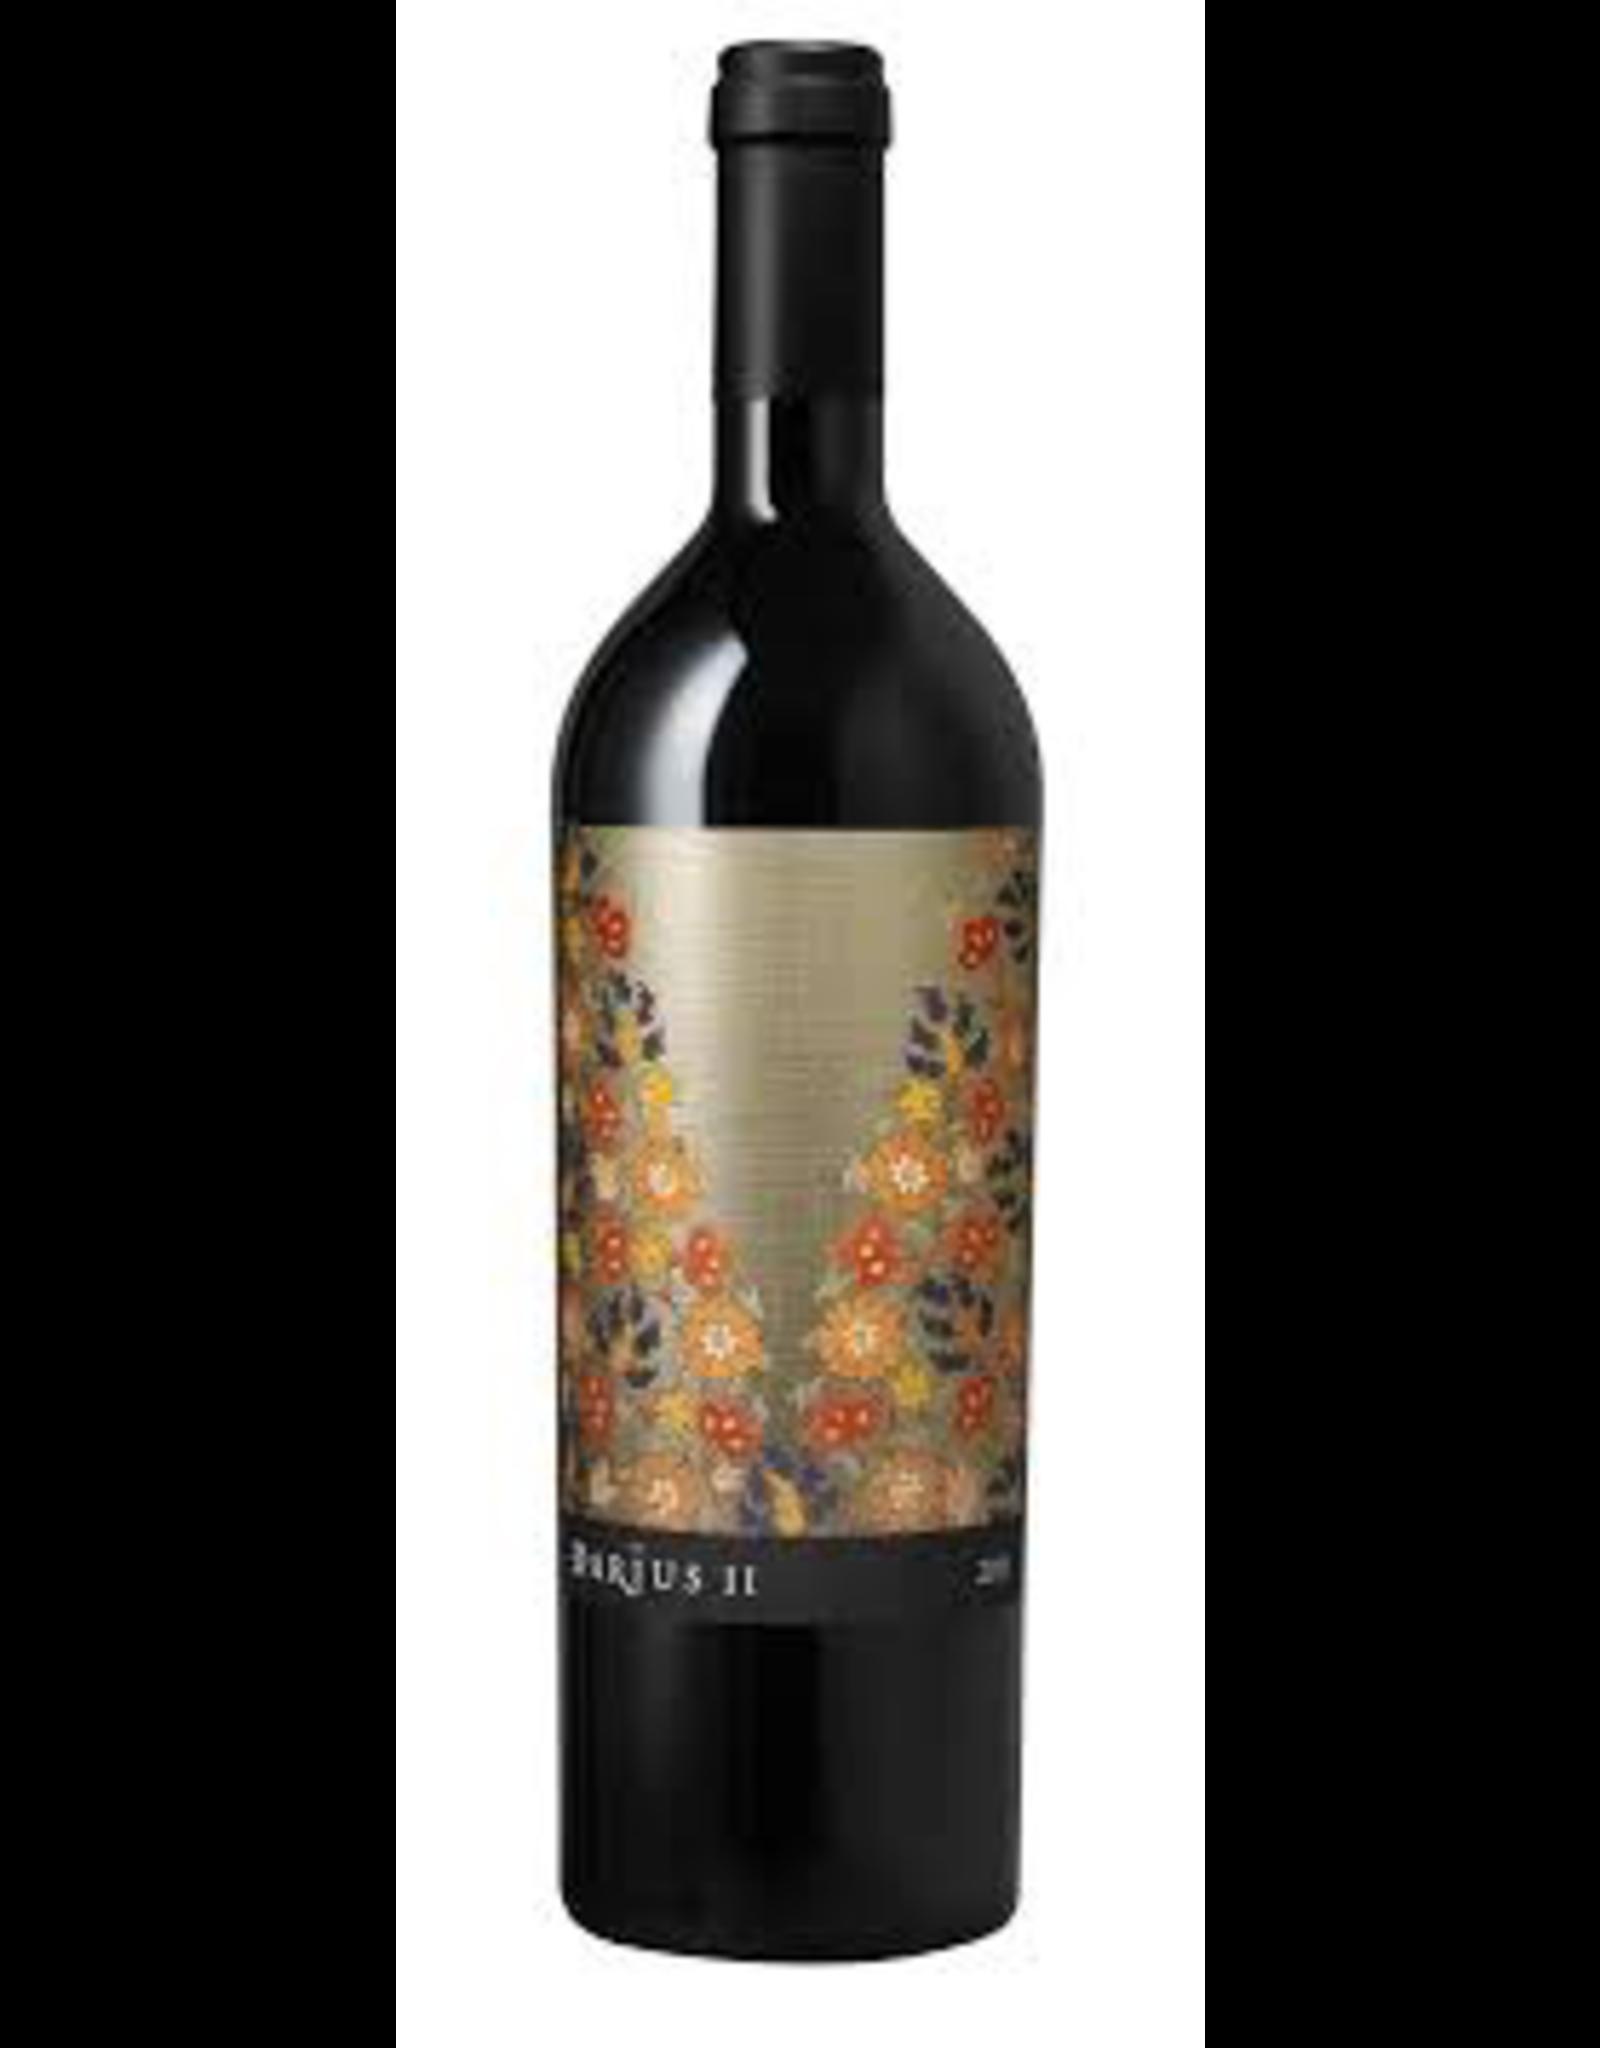 Red Wine 2015, Darioush Darius II, Cabernet Sauvignon, Sage Vineyard, Napa Valley, California, 14.8% Alc, CT